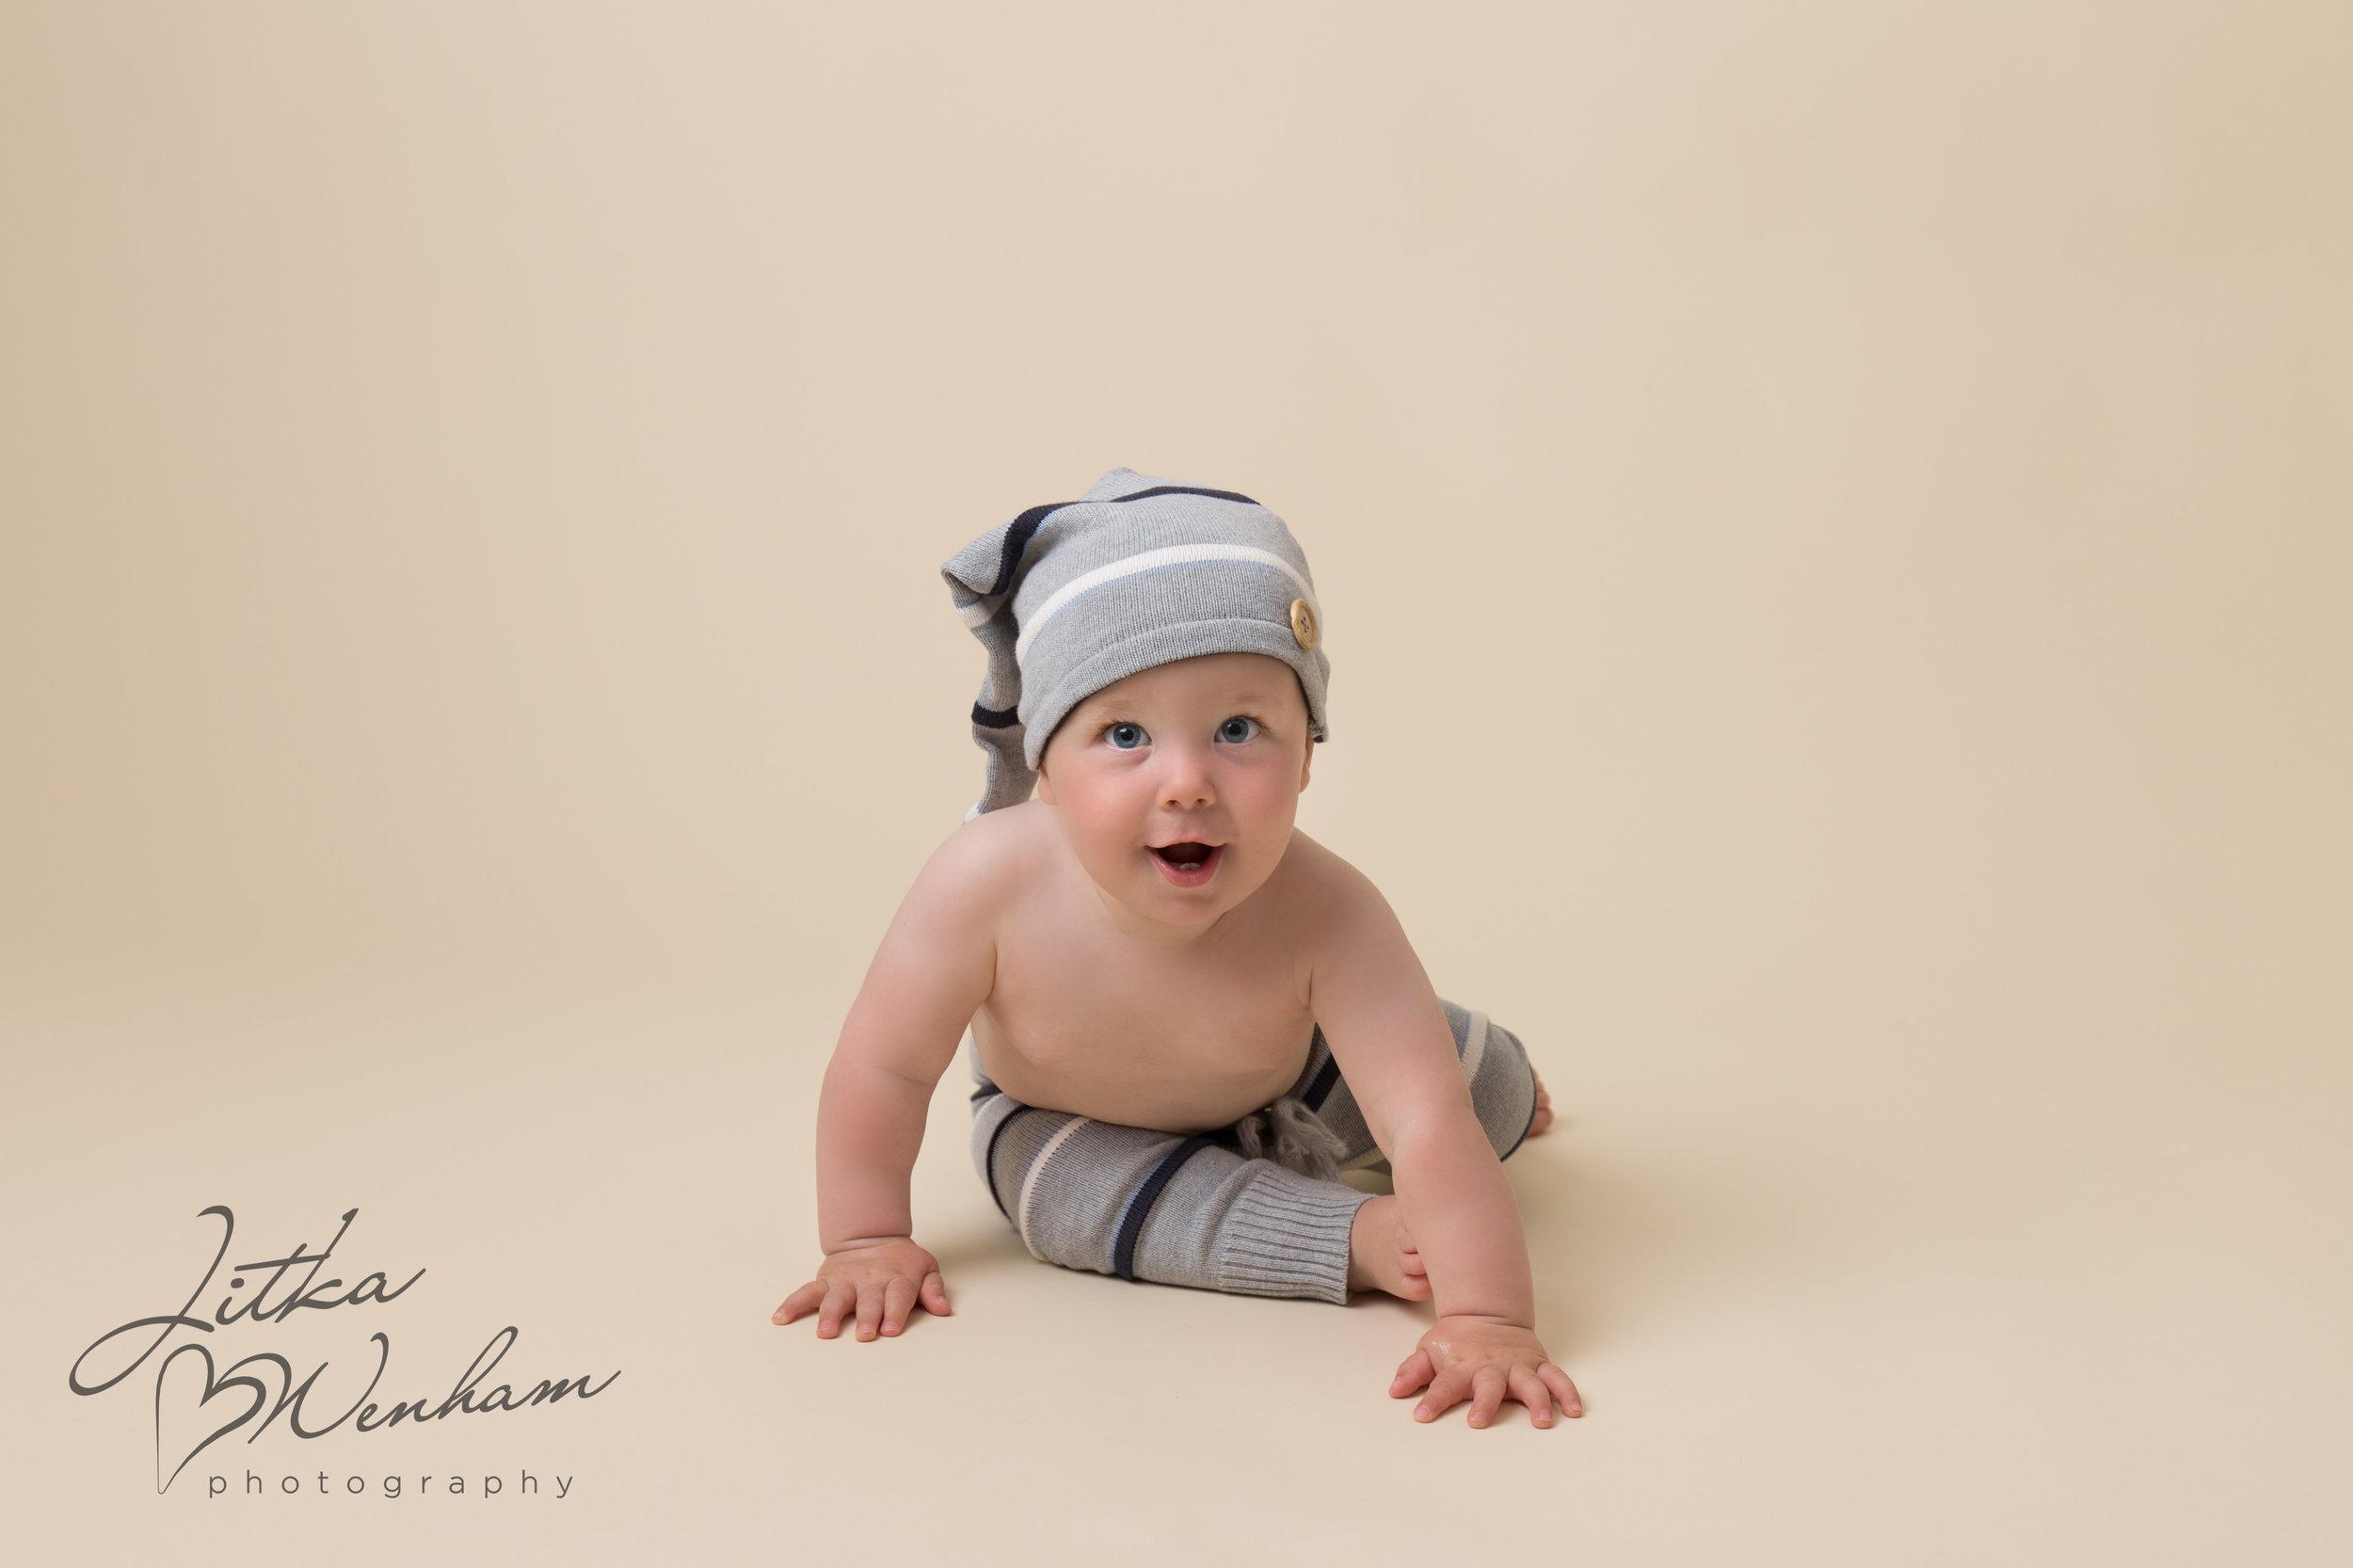 newborn-photography-children-baby-milton keynes-cake-smash-1-5.jpg